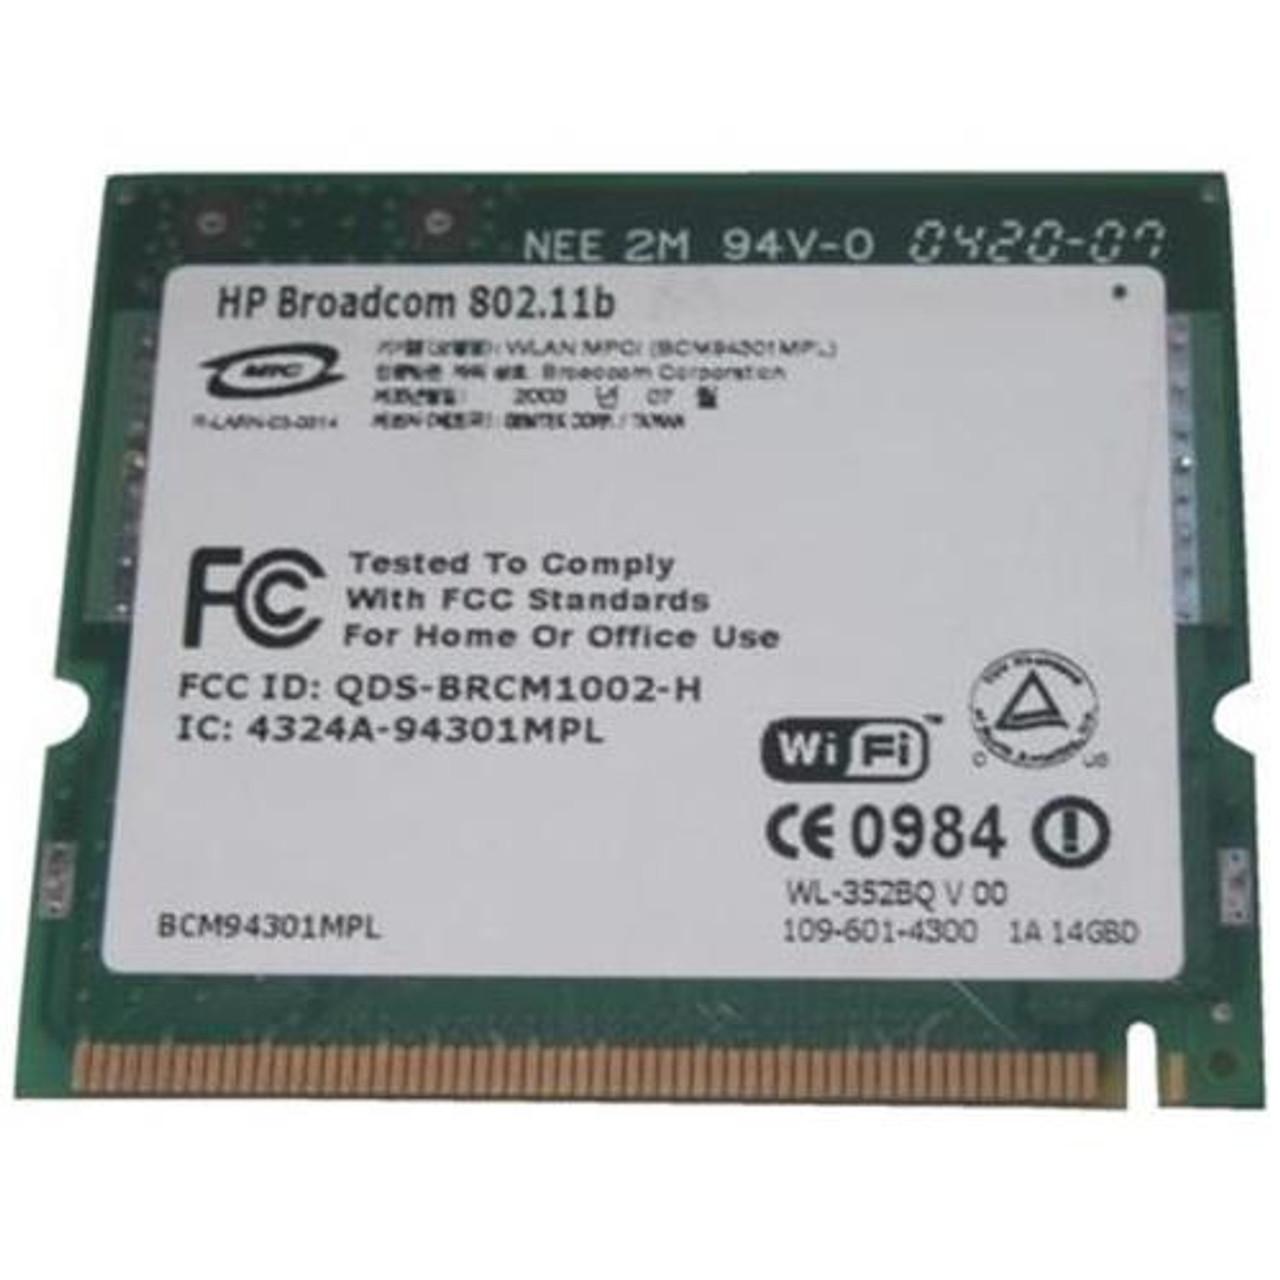 HP Mini 1100CM Broadcom WLAN Drivers Windows